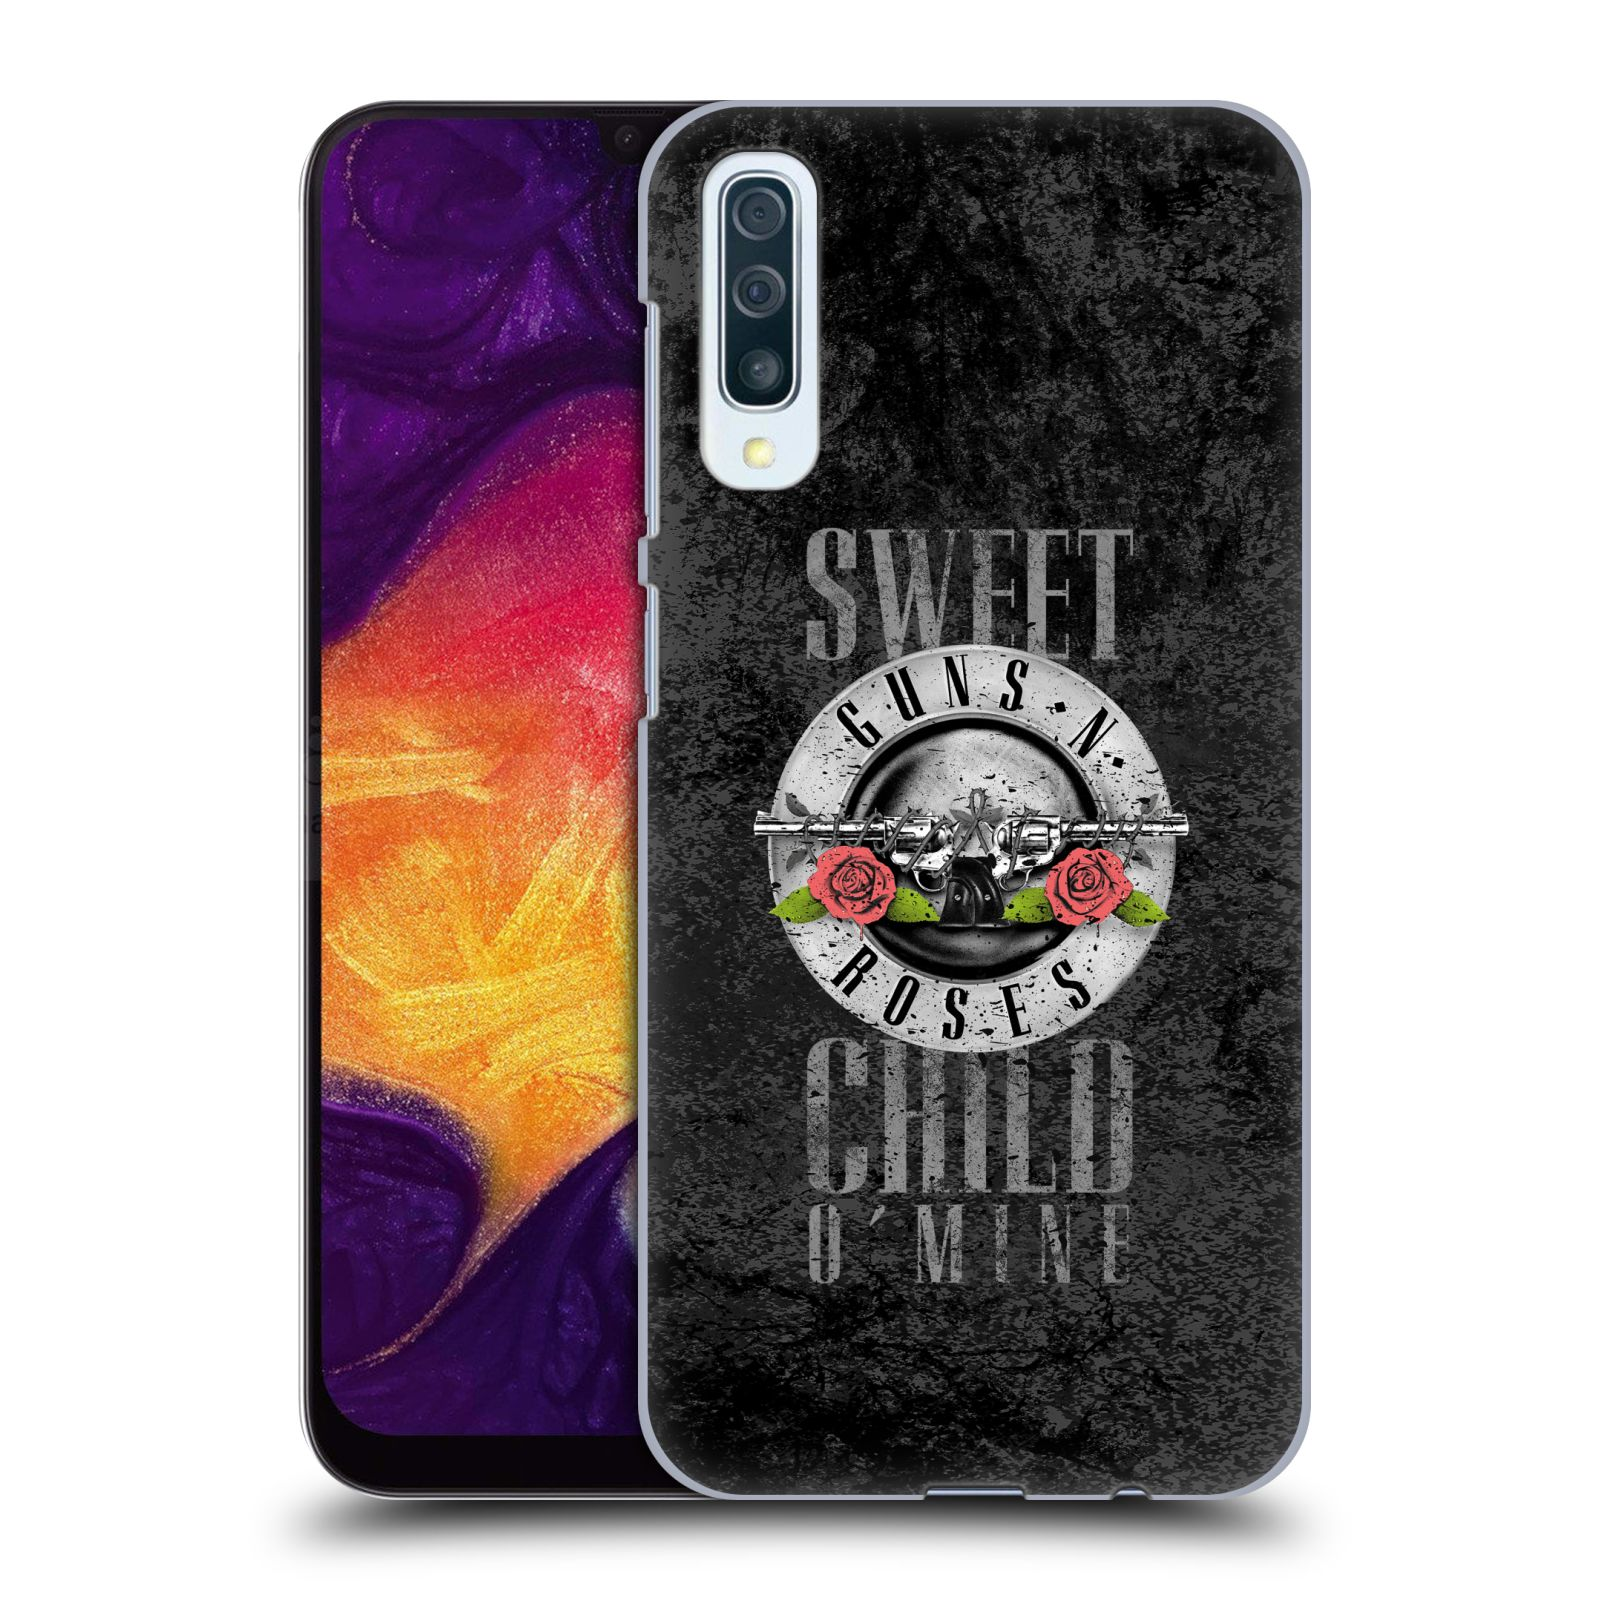 Plastové pouzdro na mobil Samsung Galaxy A50 - Head Case - Guns N' Roses - Sweet Child